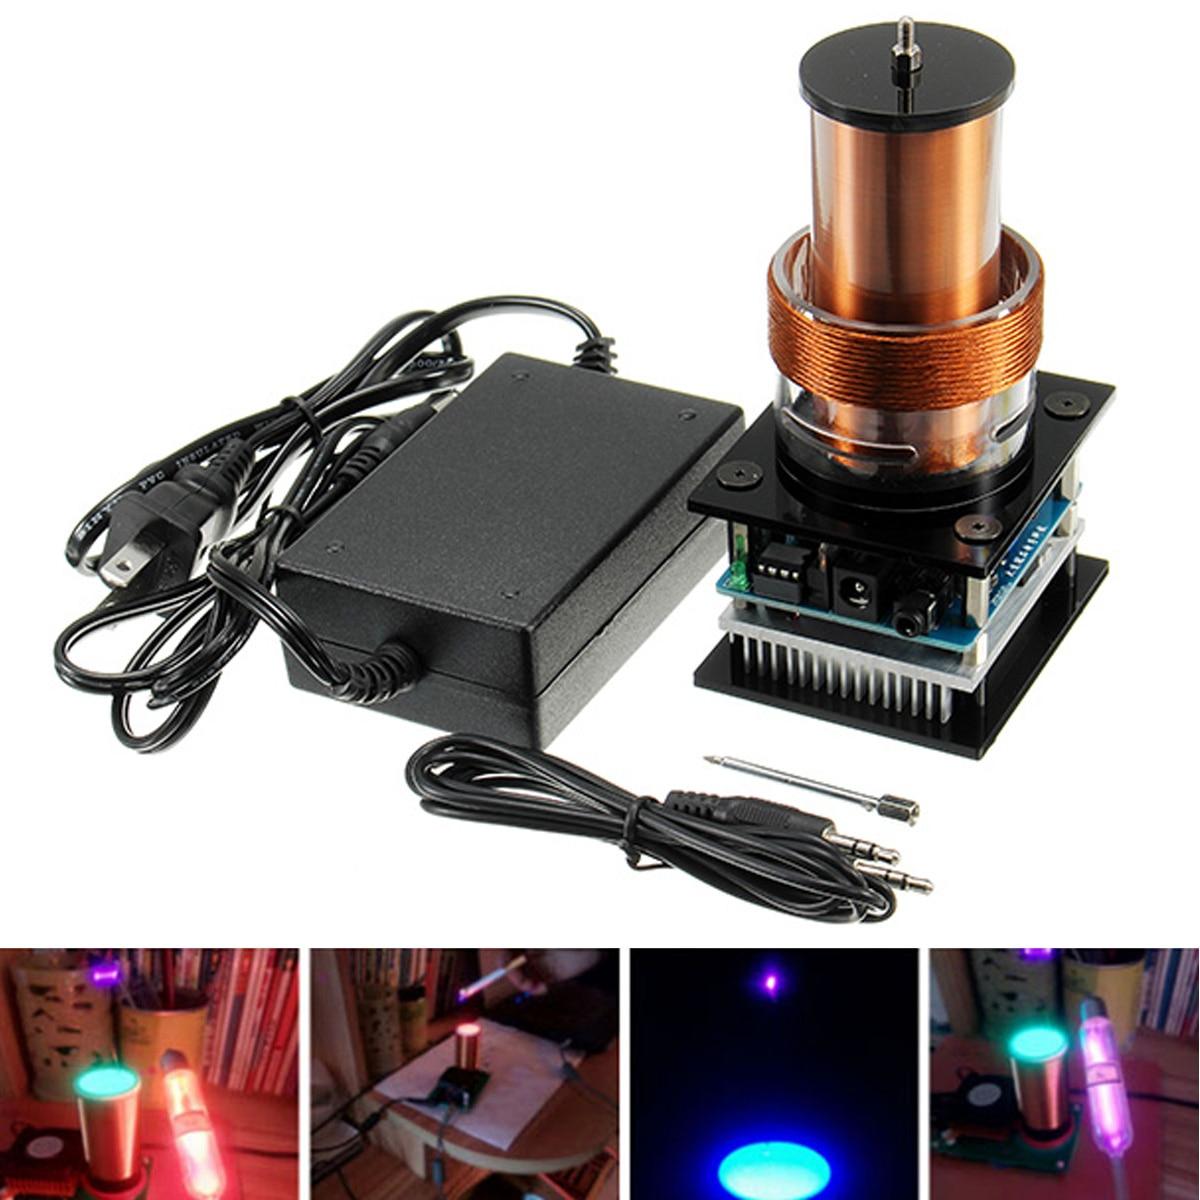 DC24V 1800mA Mini Tesla Coil Music Audio Sound Plasma Speaker Loud and Clear Sound US Plug